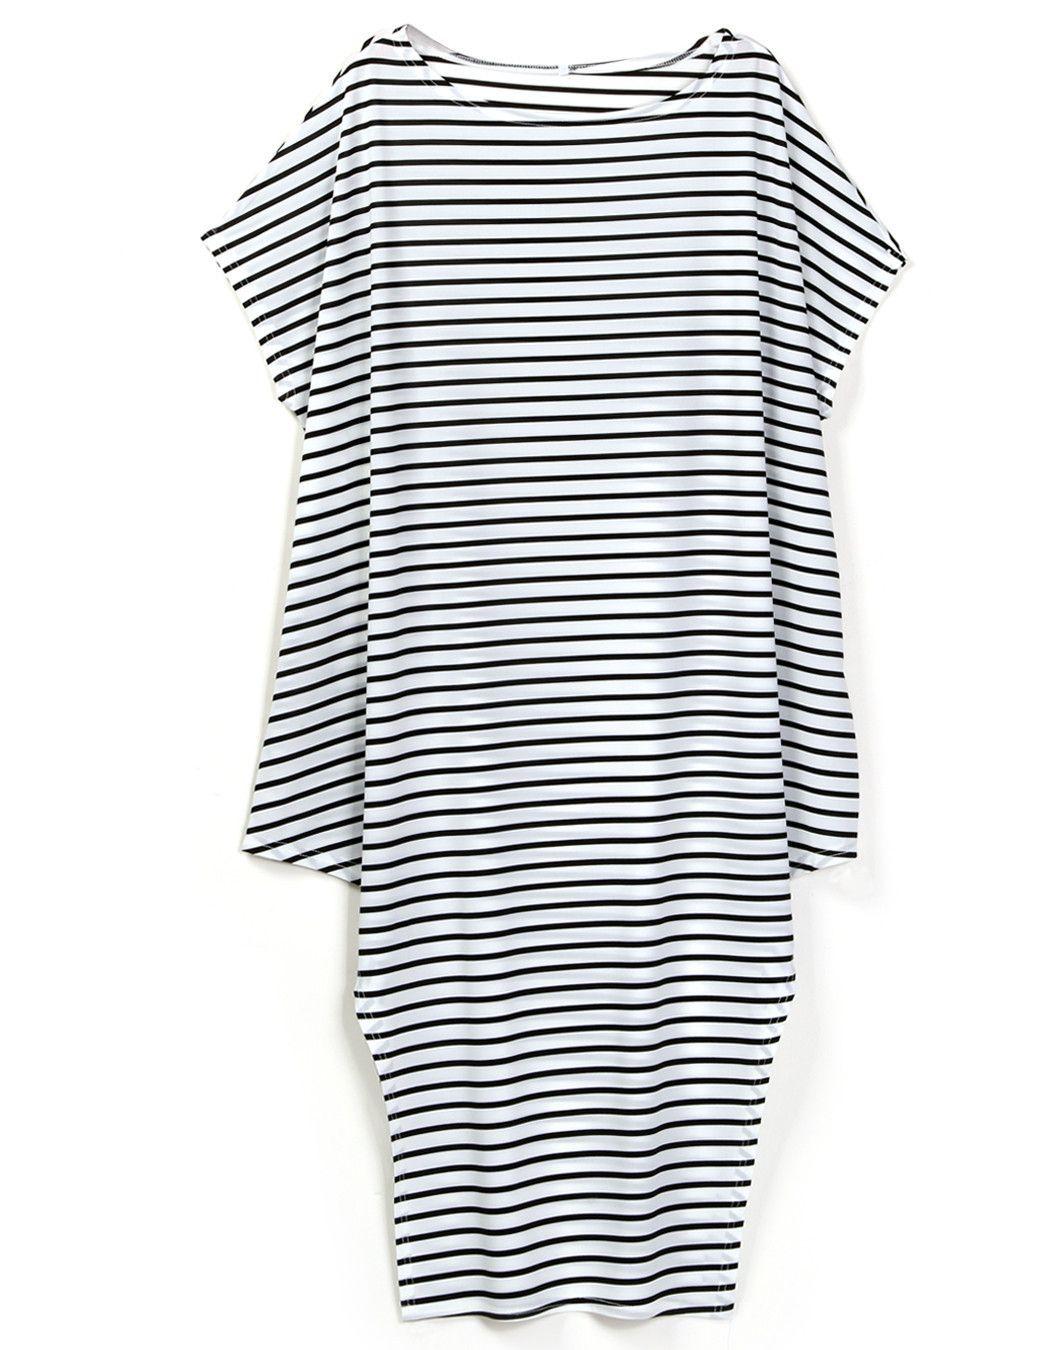 Loose round neck batwing sleeve irregular hem maxi dress